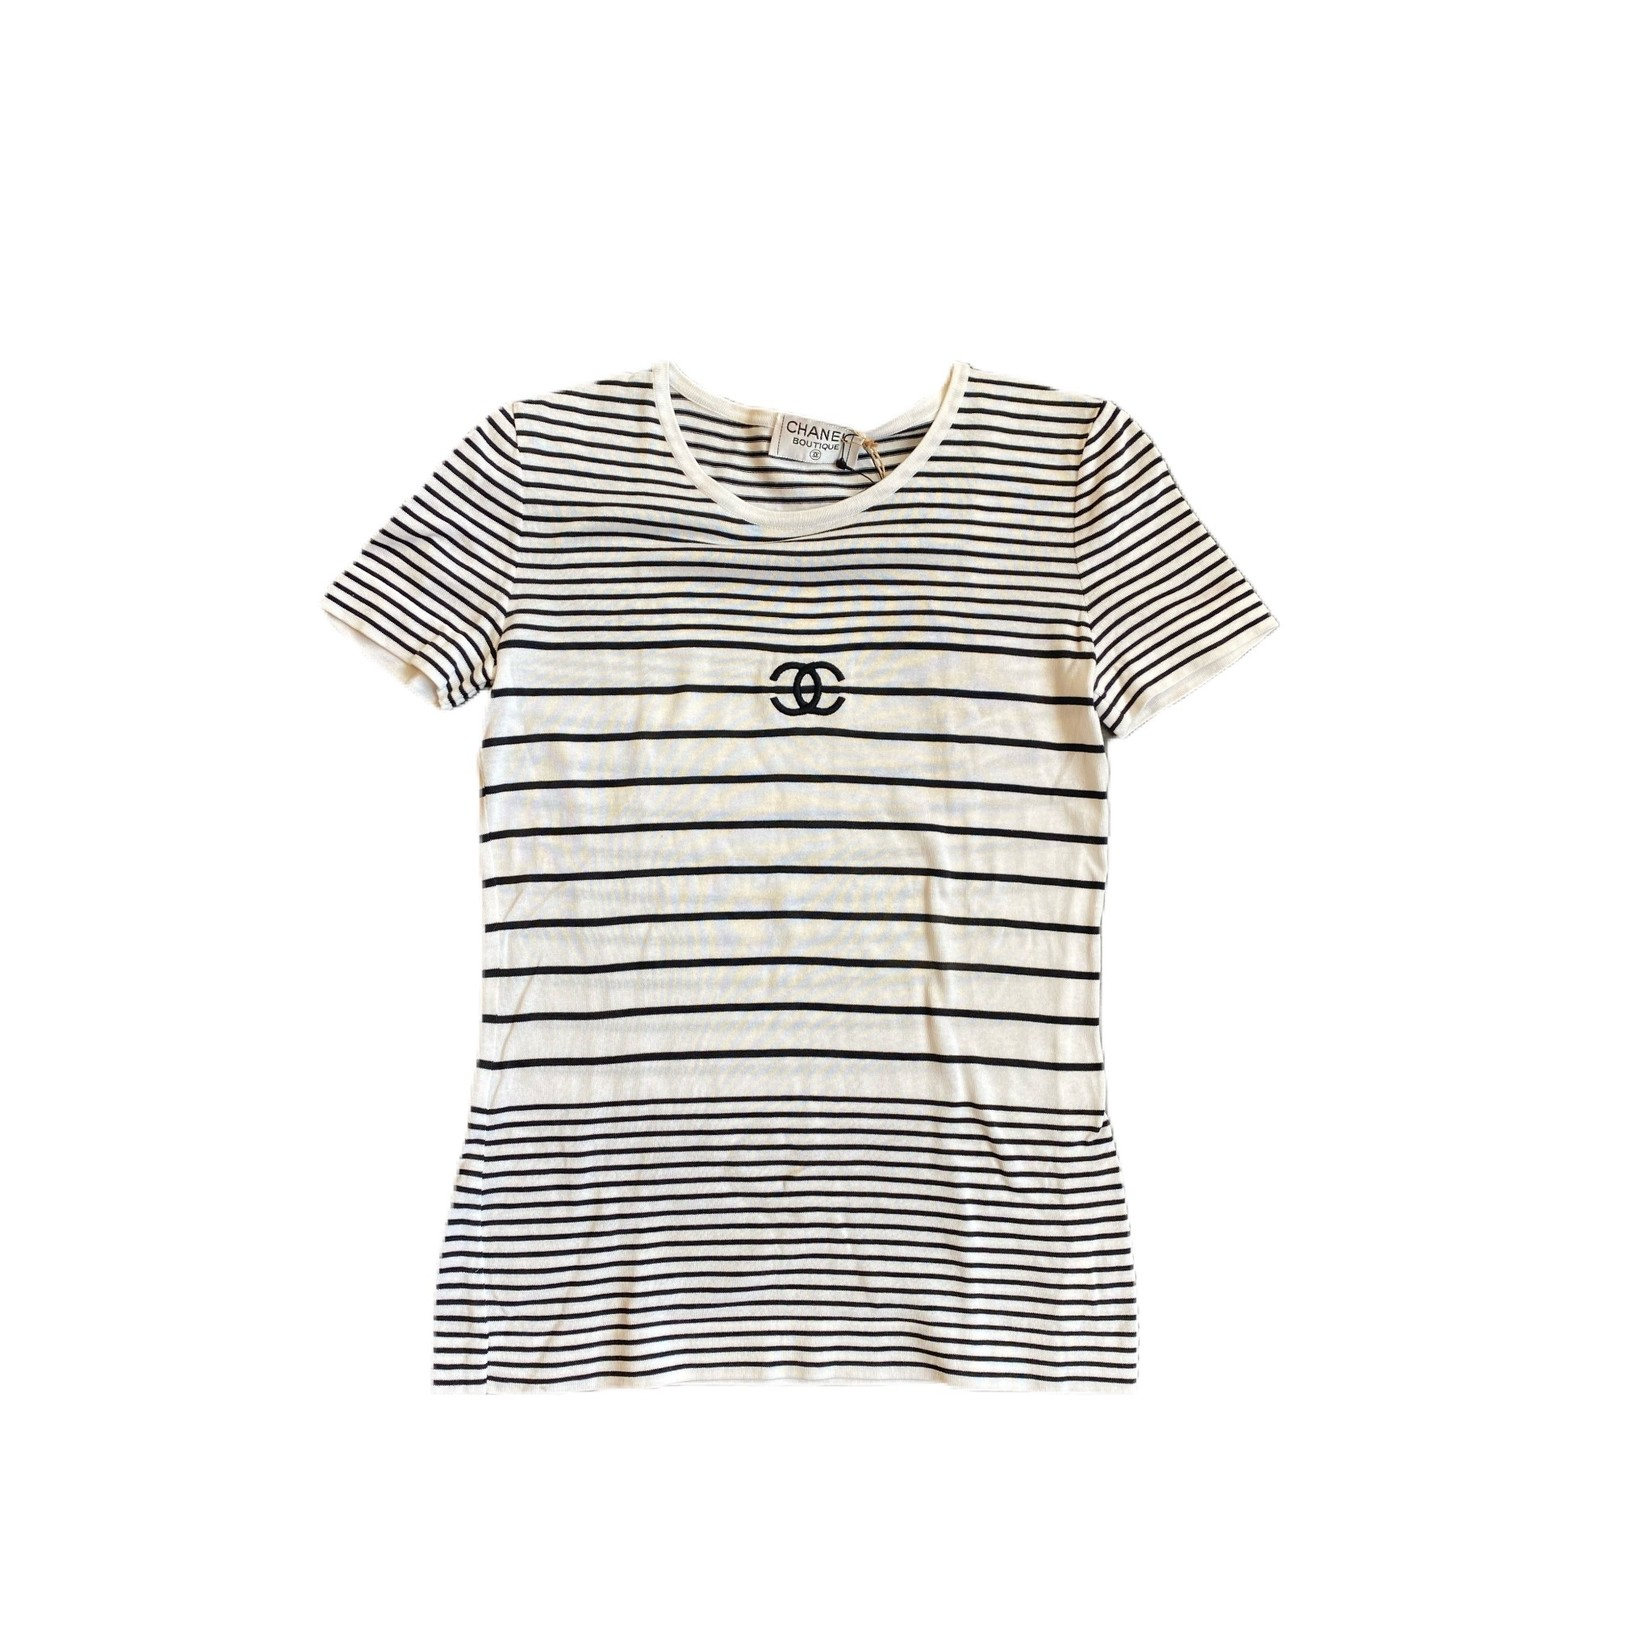 Wyld Blue Vintage Chanel Round Neck Striped Short Sleeve Top Black/White